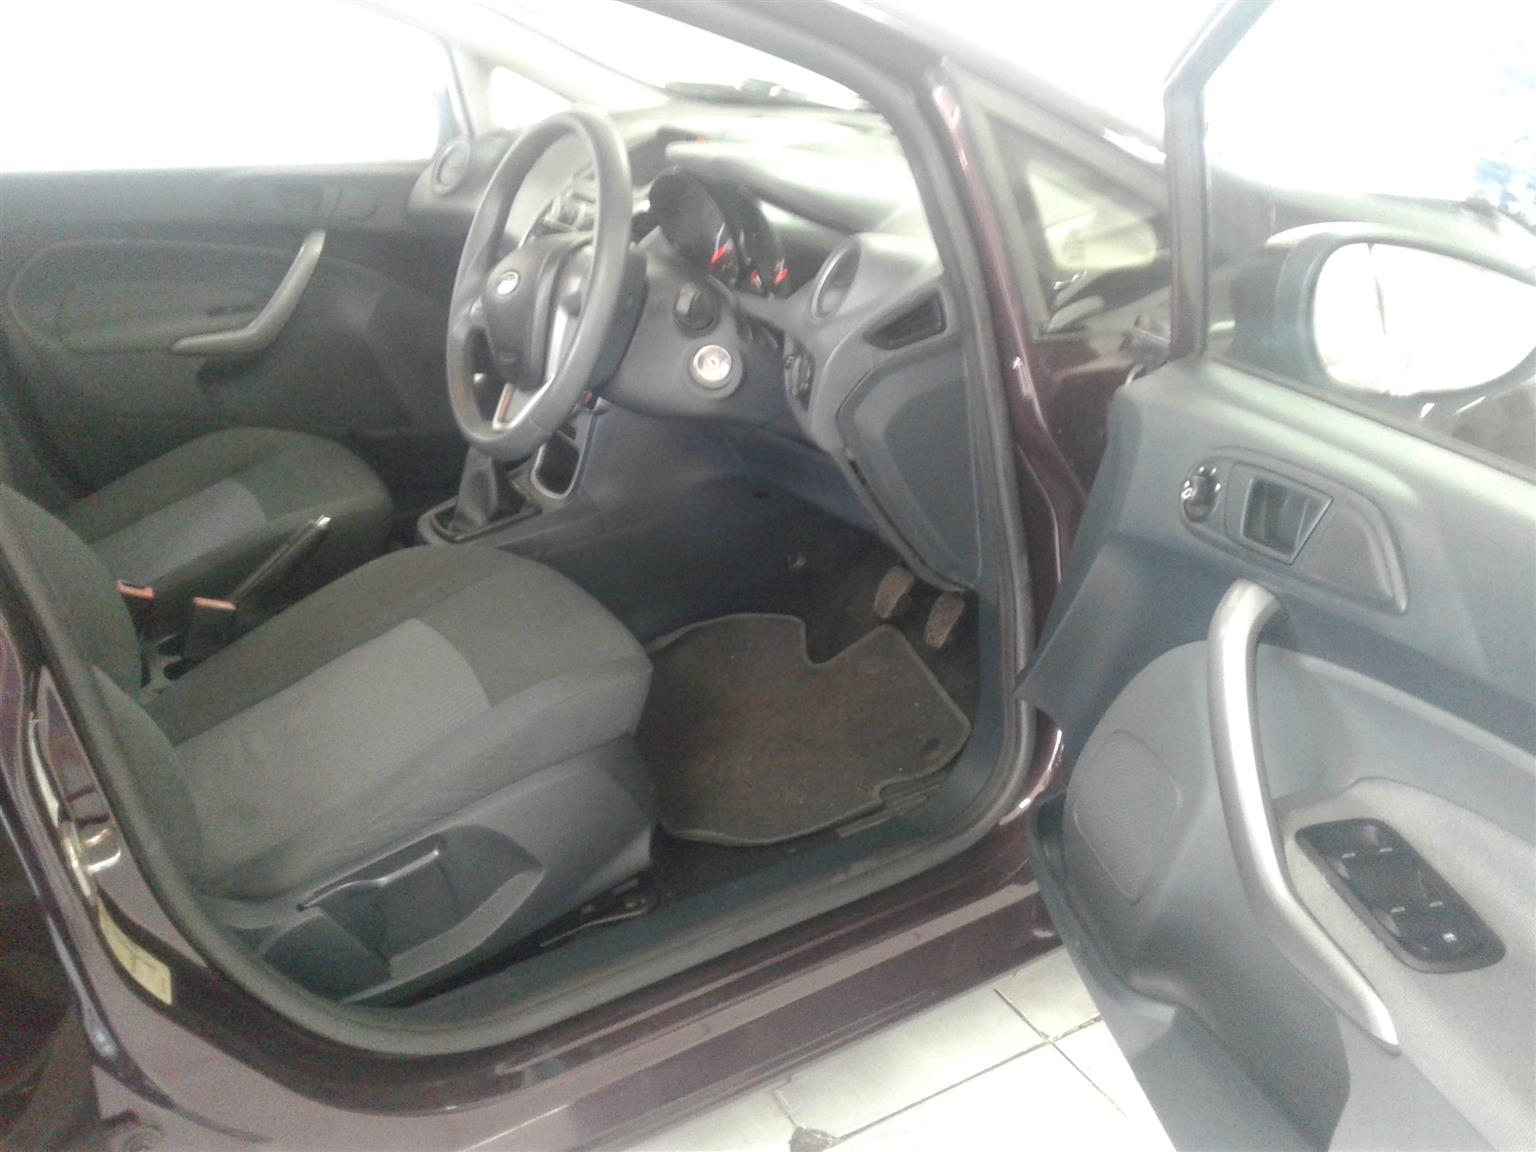 2010 Ford Fiesta hatch 5-door FIESTA 1.6i AMBIENTE 5Dr